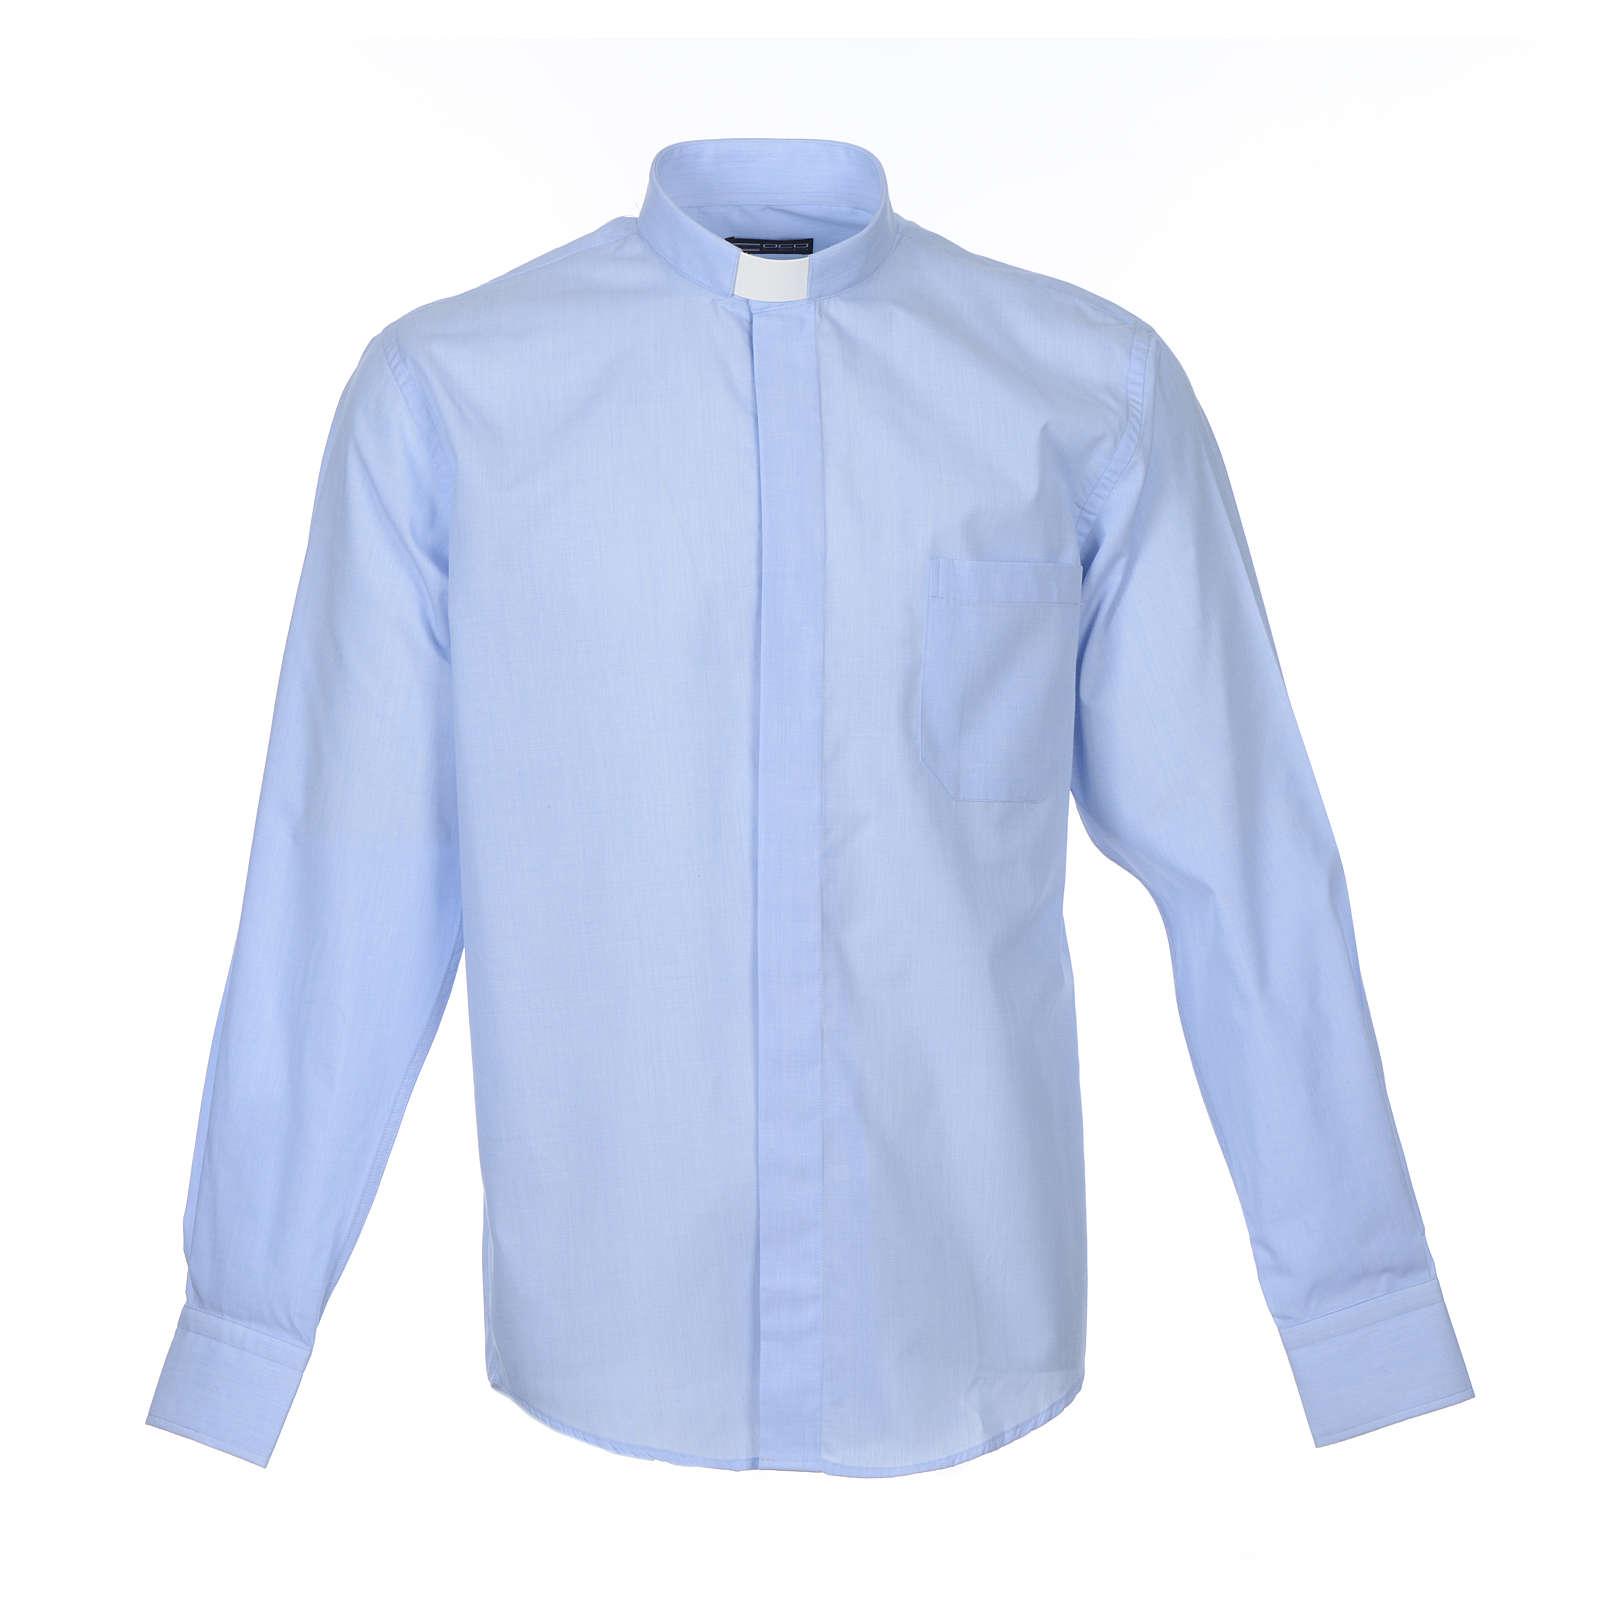 Camicia clergy M. Lunga Filo a Filo misto cotone Celeste 4